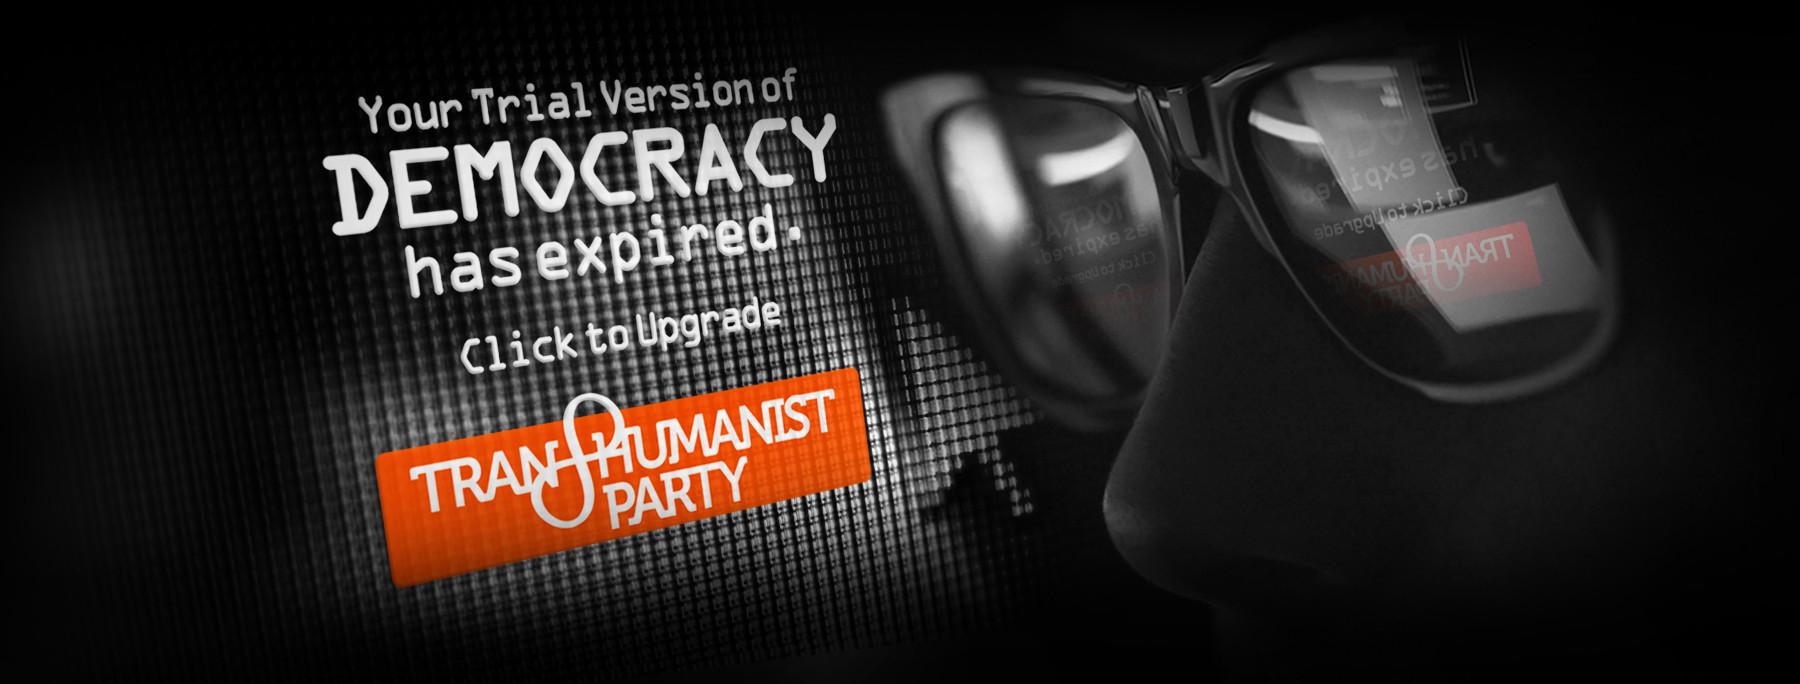 Partidul politic format de mișcarea biohacking